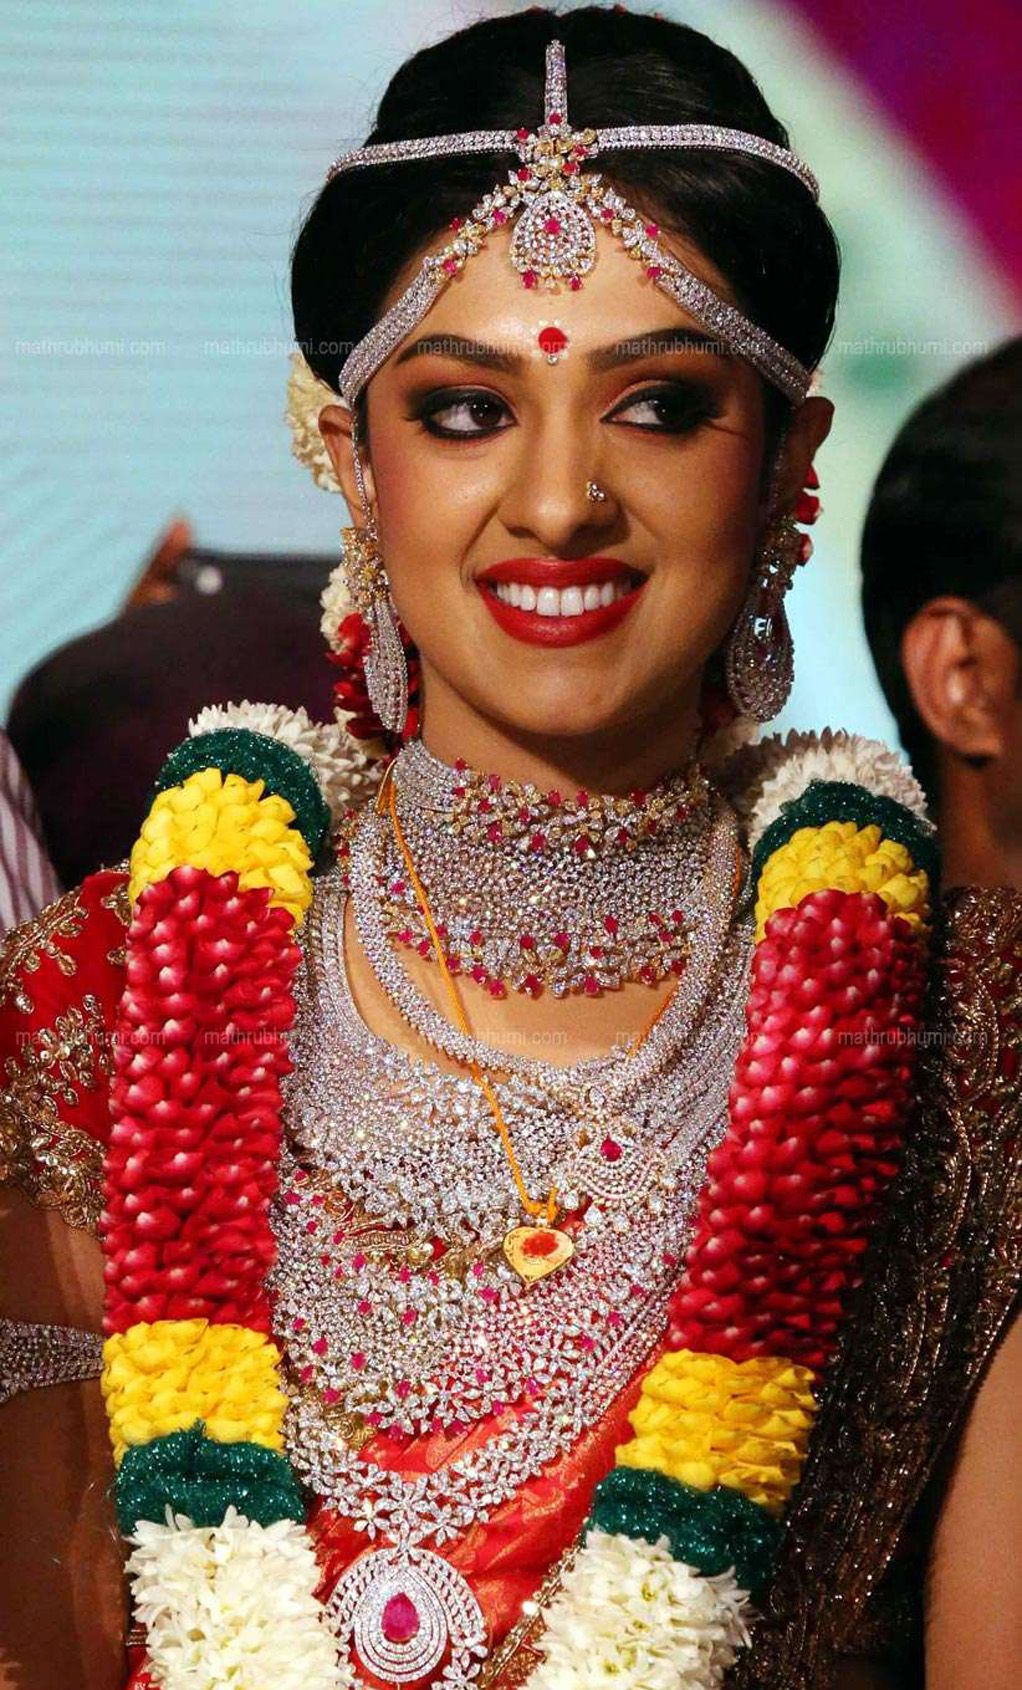 Ravi pillai daughter arathi wedding dress and ornaments photos 093